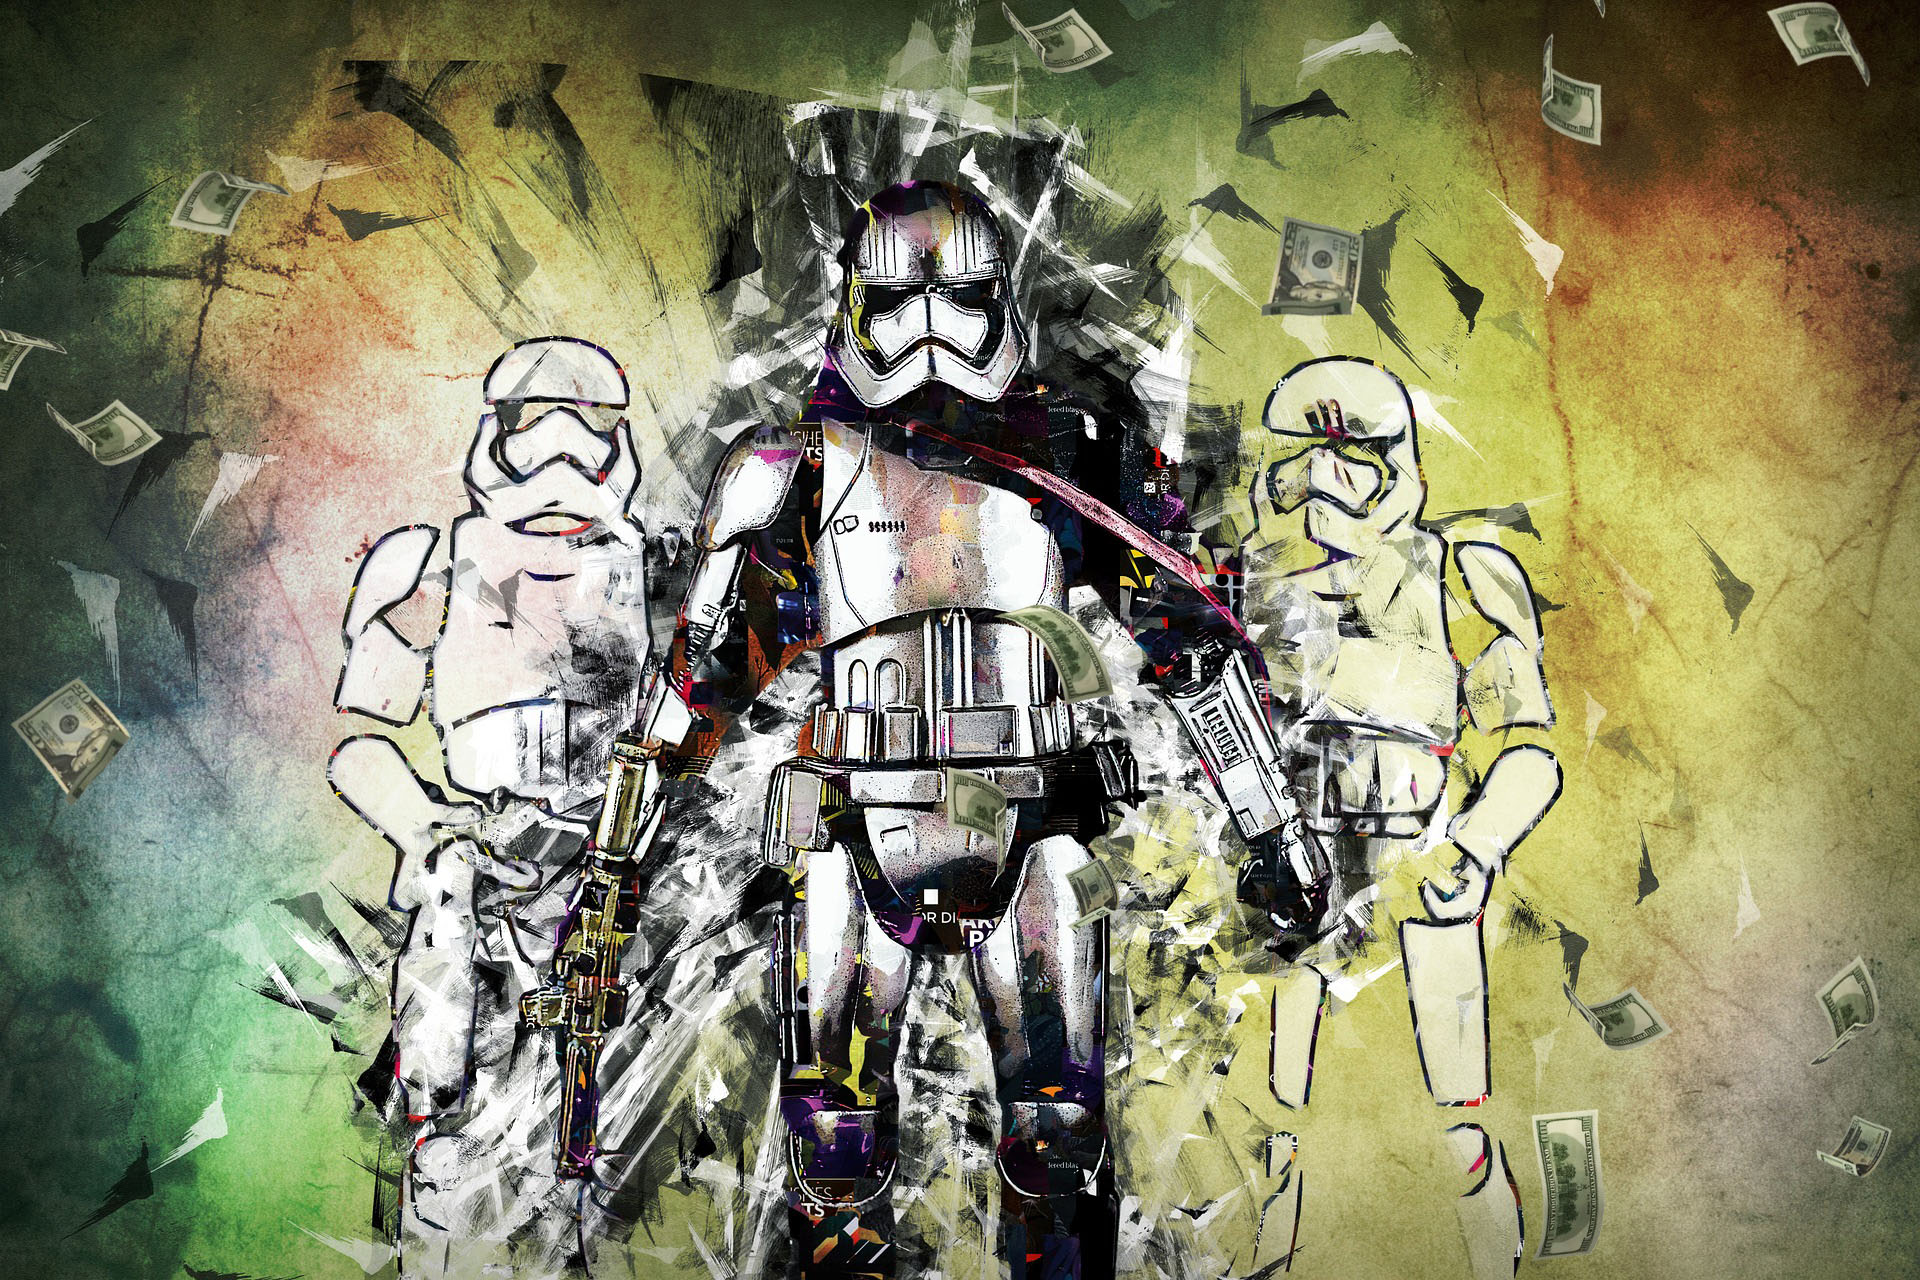 Pubblicità Insolenza R2-D2